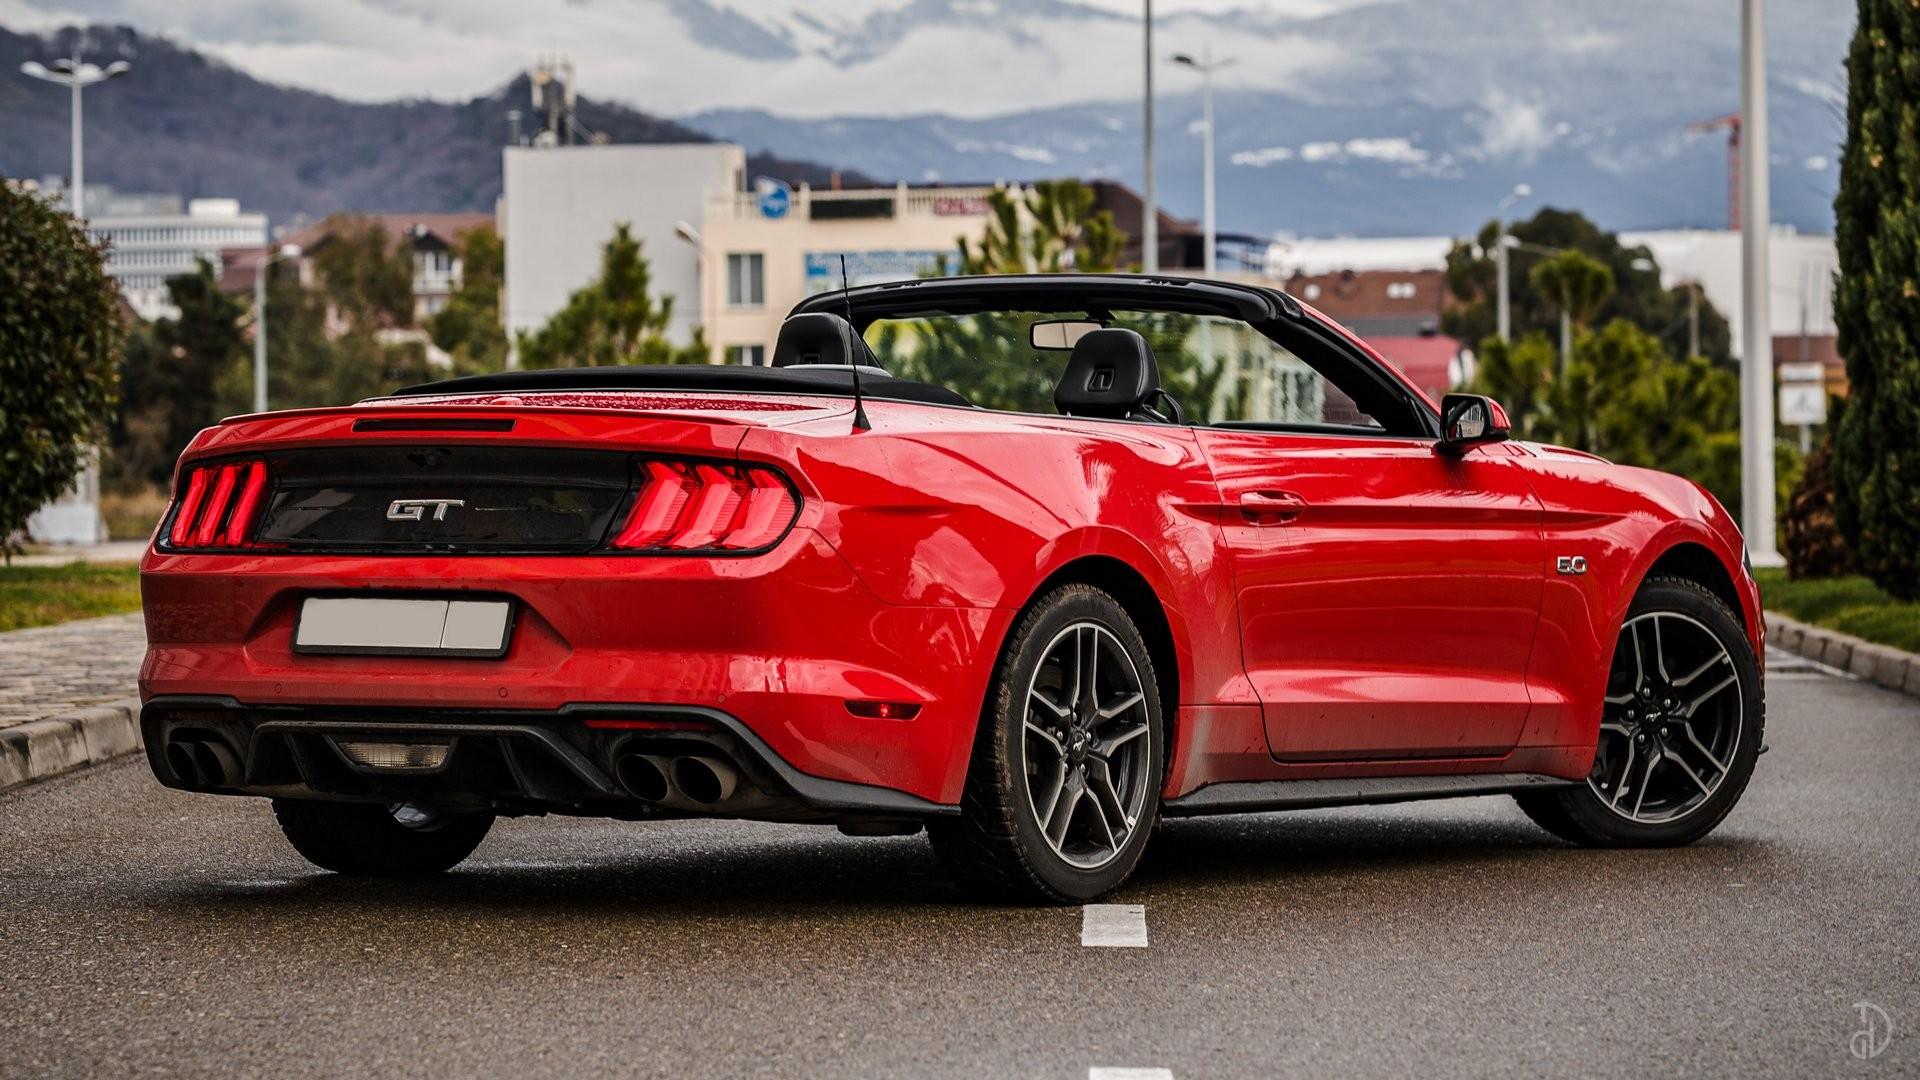 Аренда Ford Mustang GT 5.0 в Сочи. Фото 2